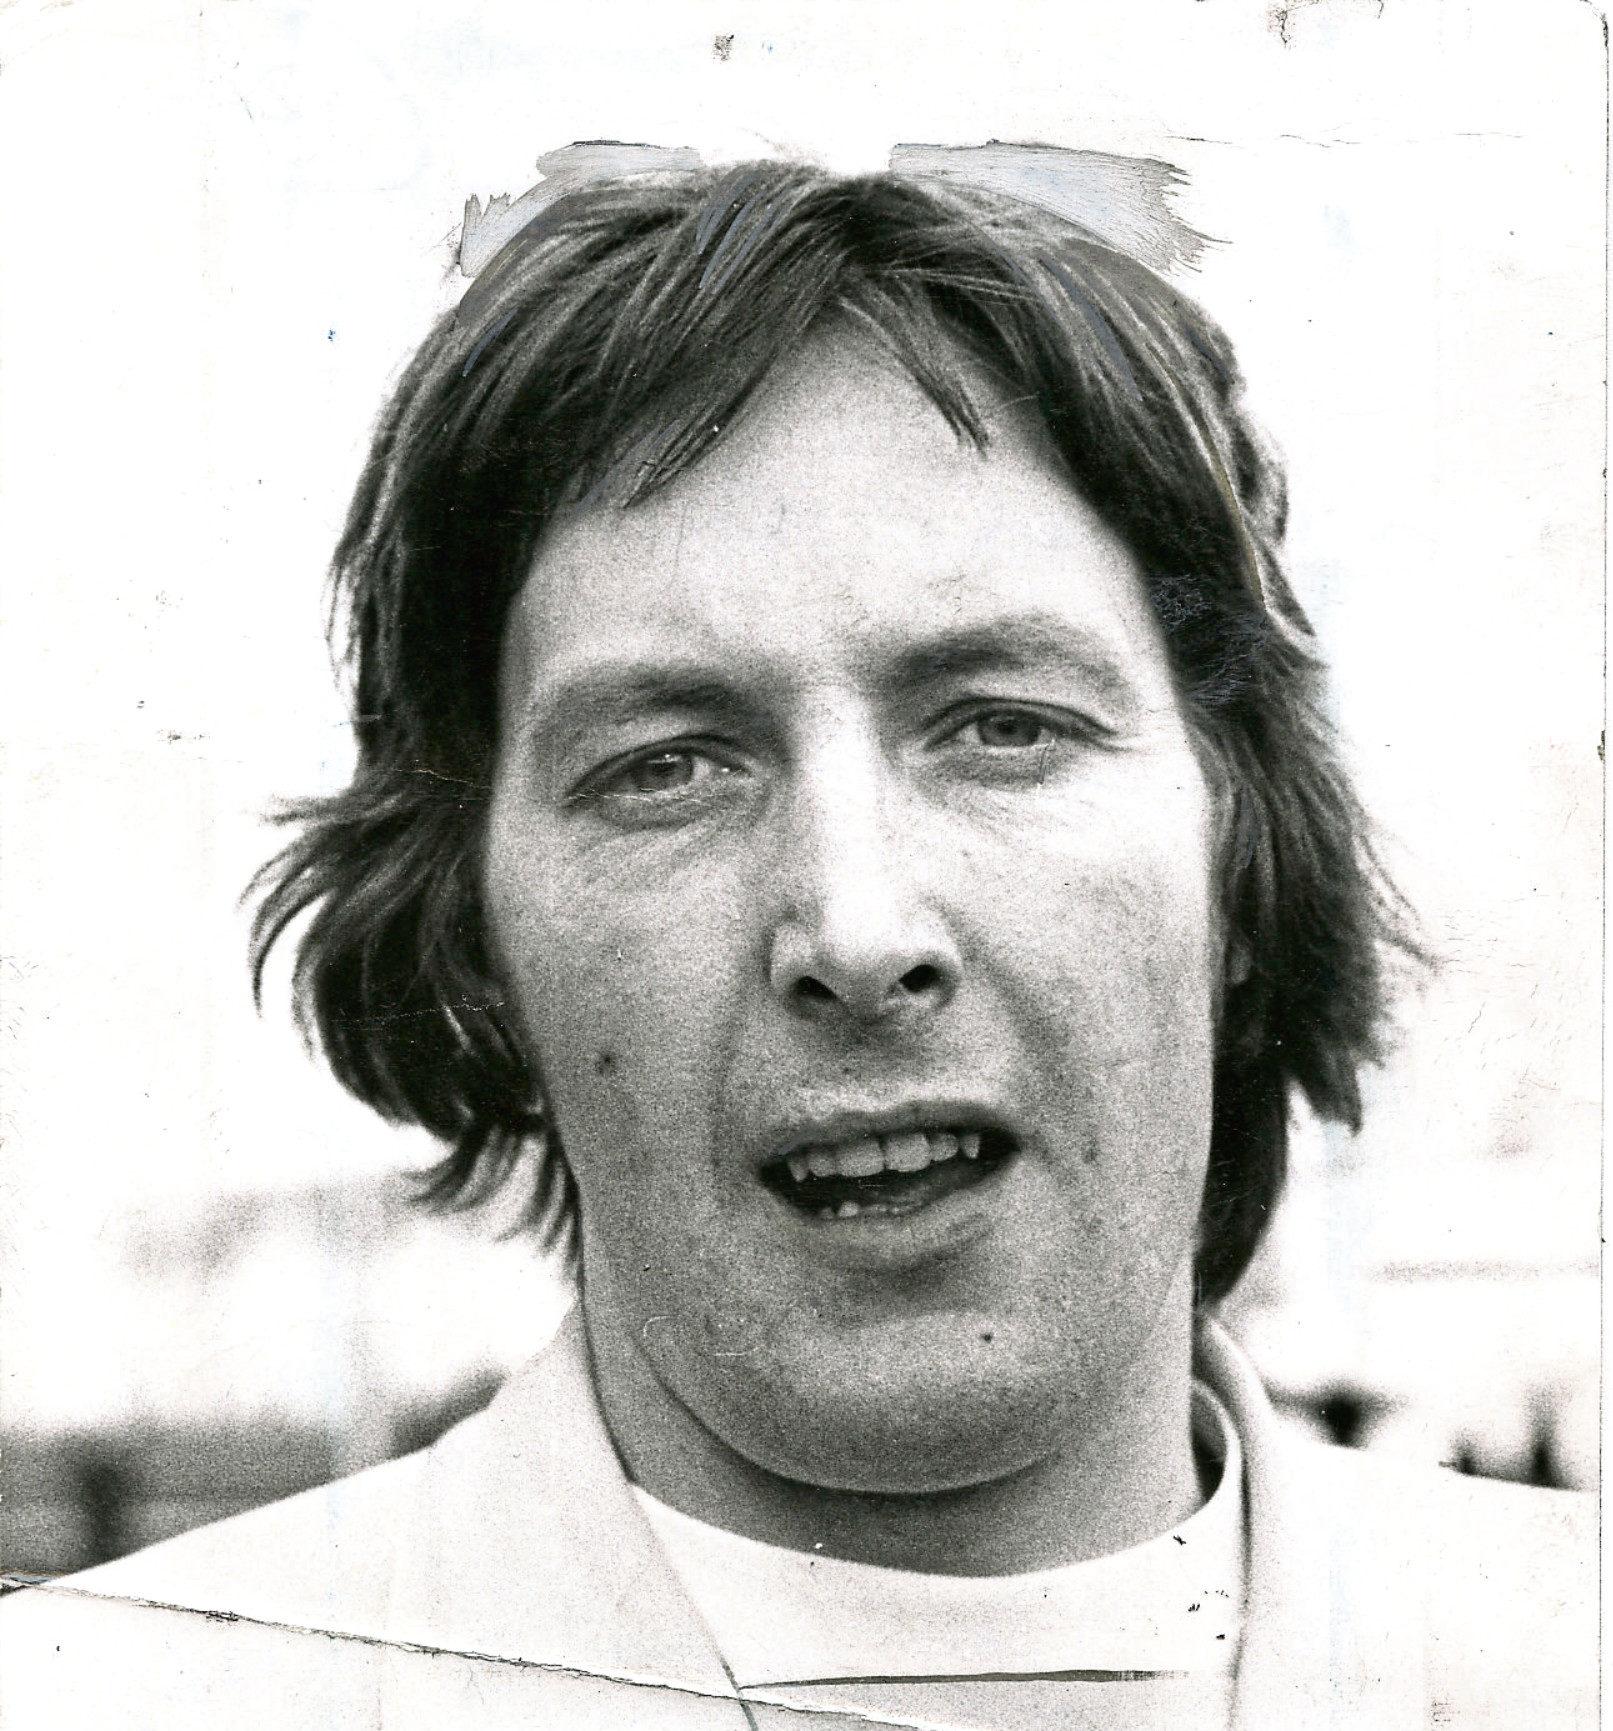 Brian Wilson in 1964